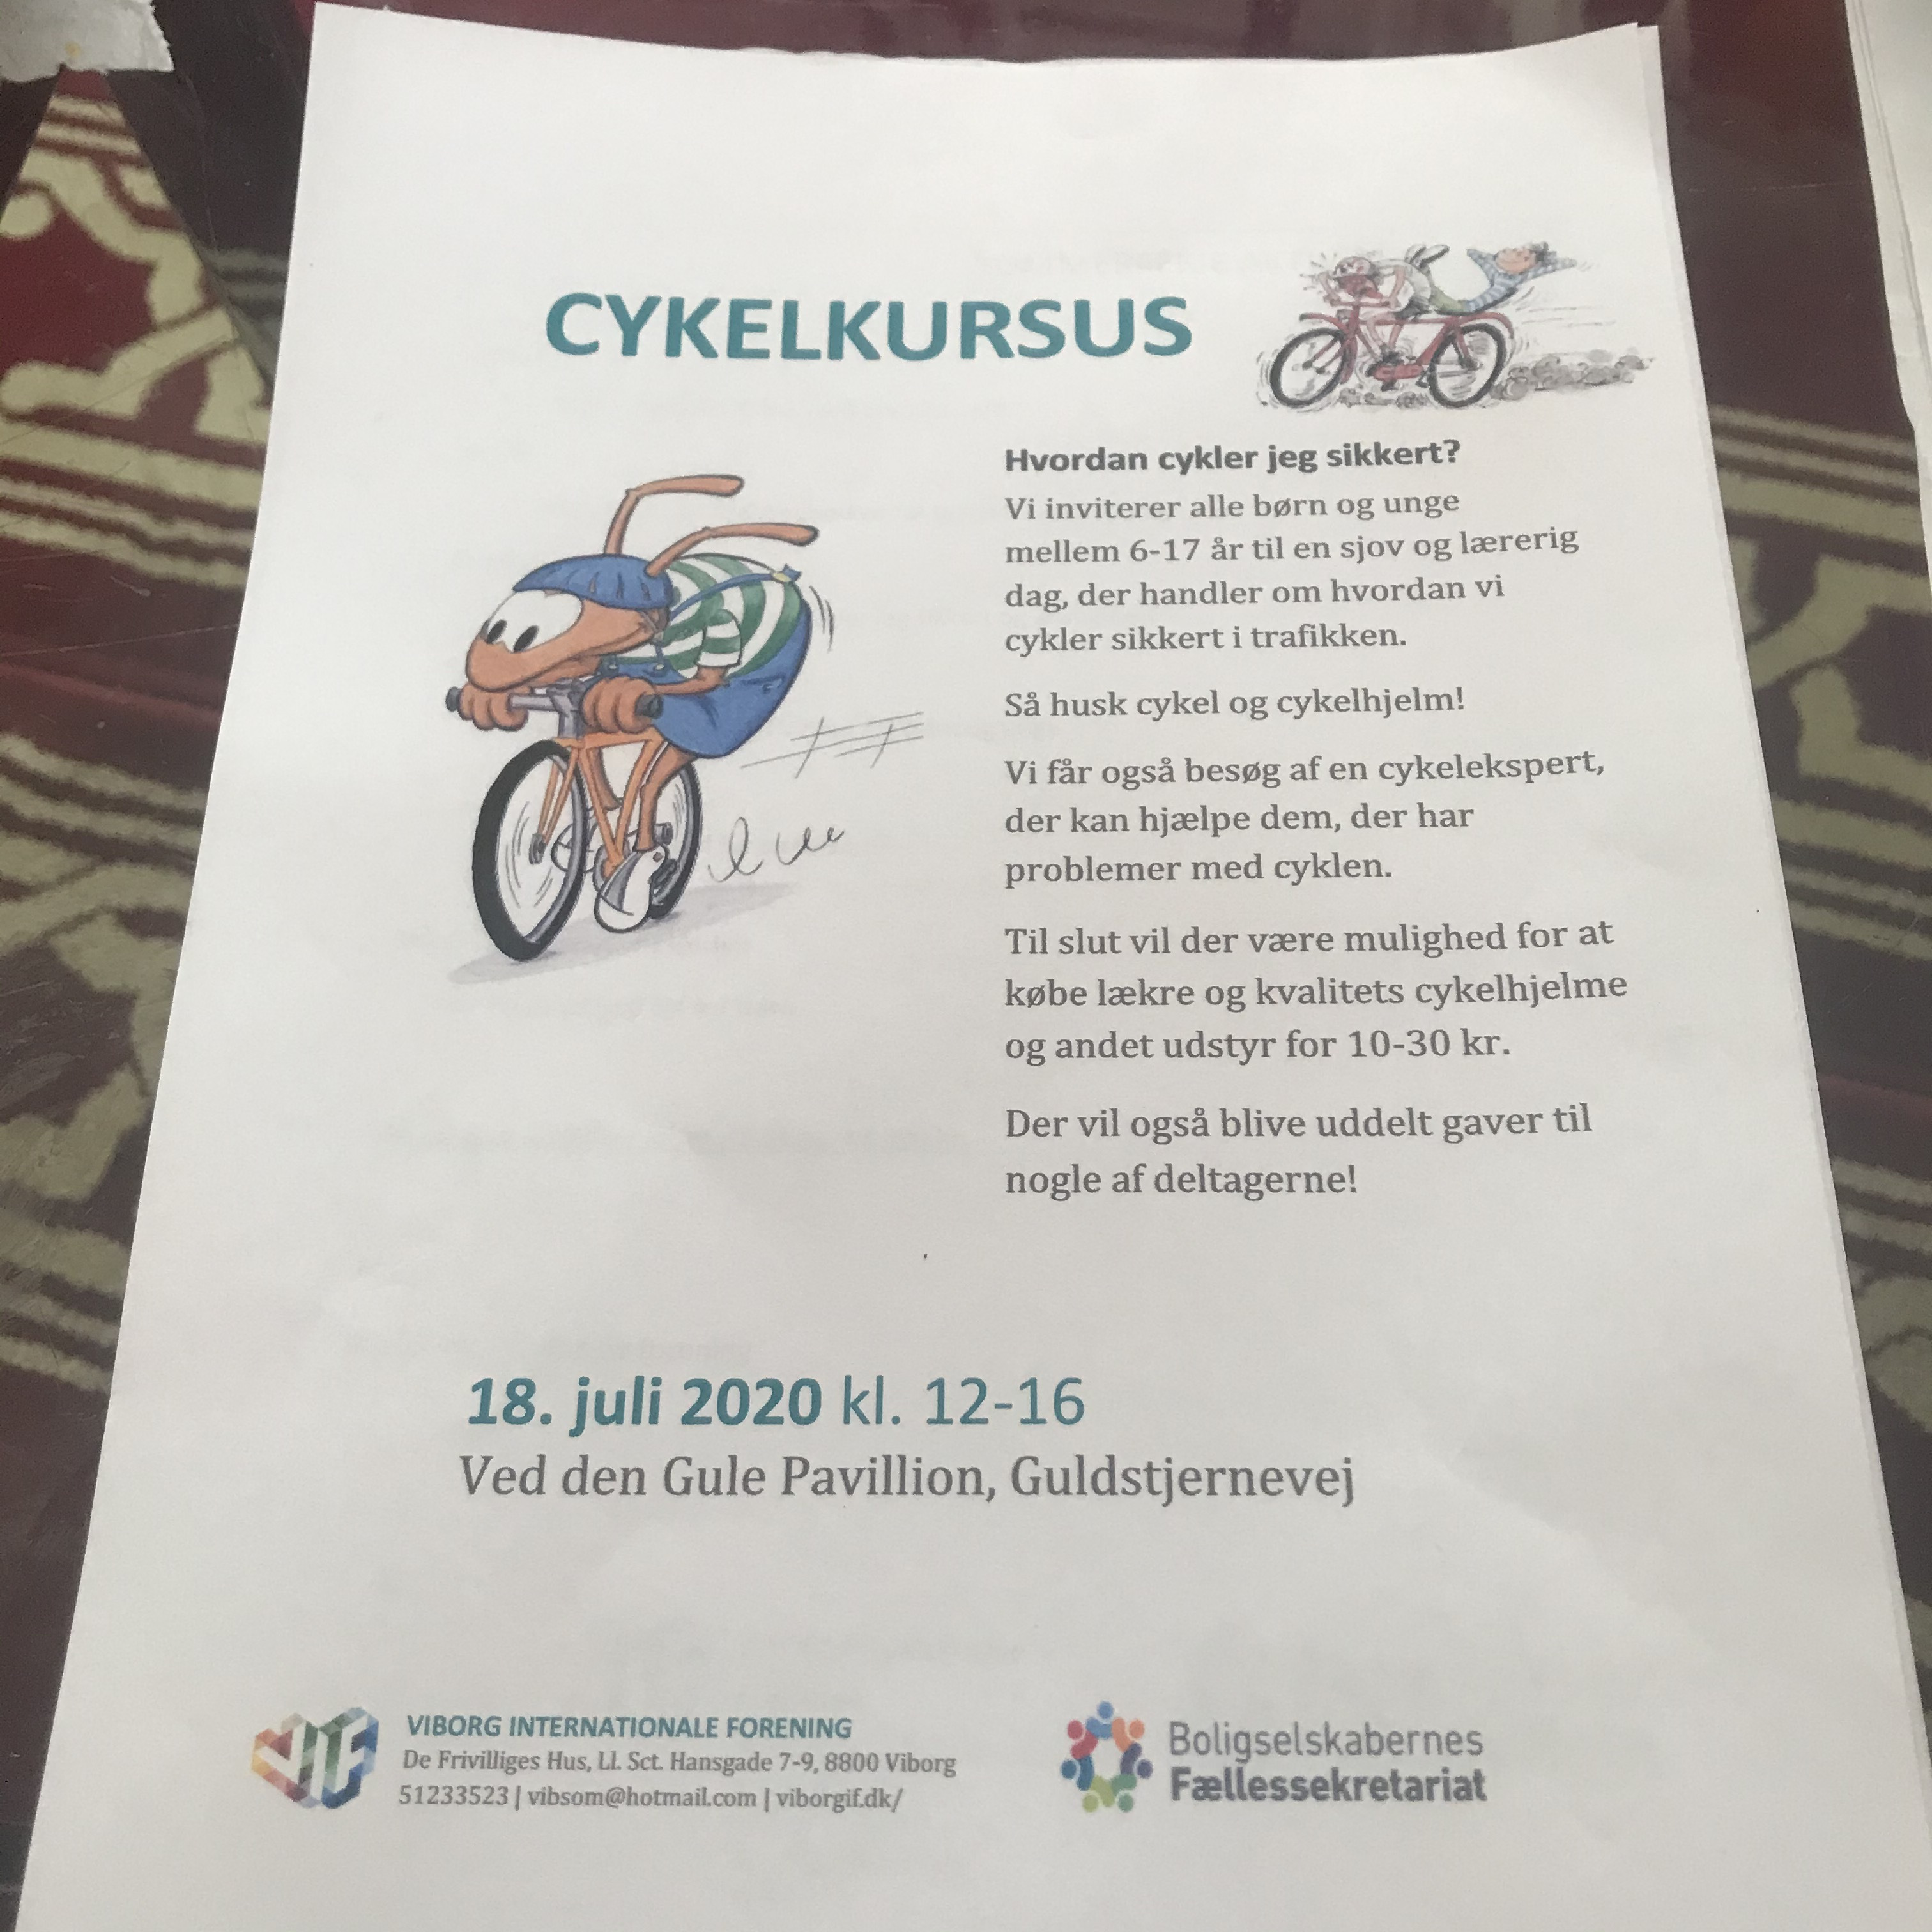 Cykelkursus-003